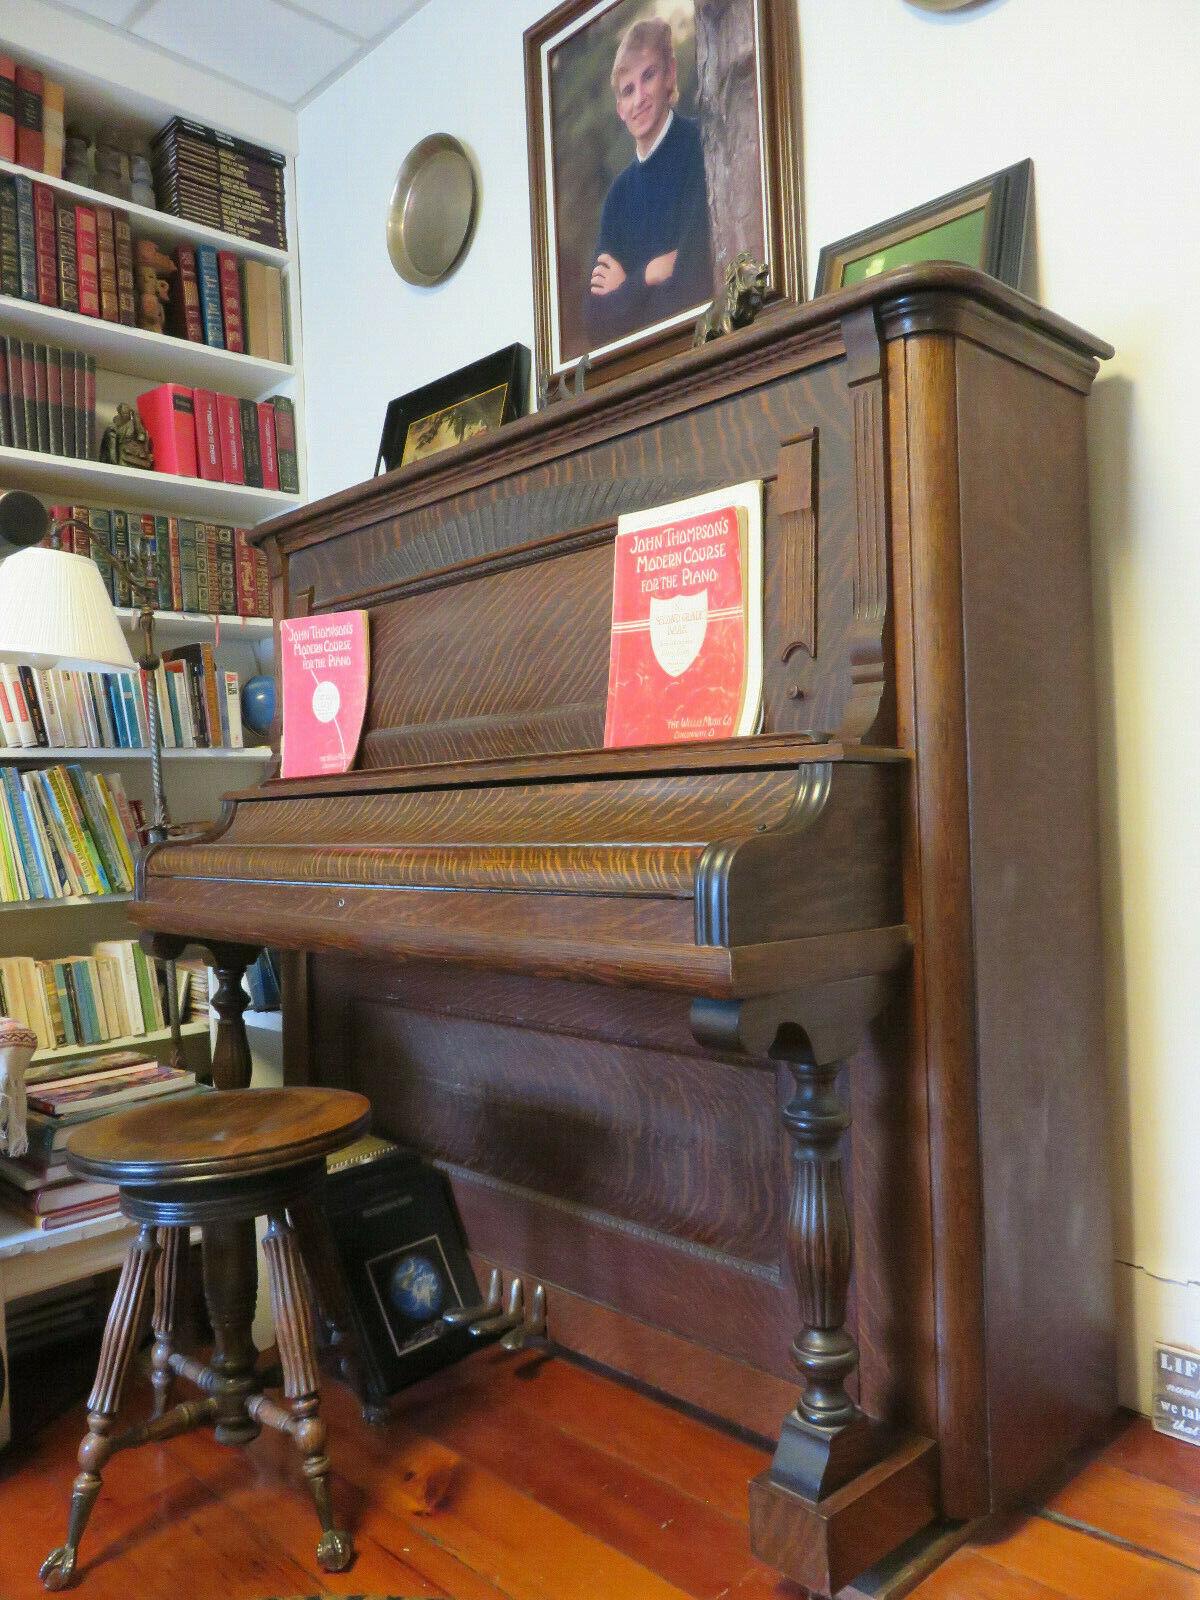 1874-1920 VINTAGE UPRIGHT OAK PIANO, DURCH CLOUGH & WARREN, STOOL HAS CLAW FEET